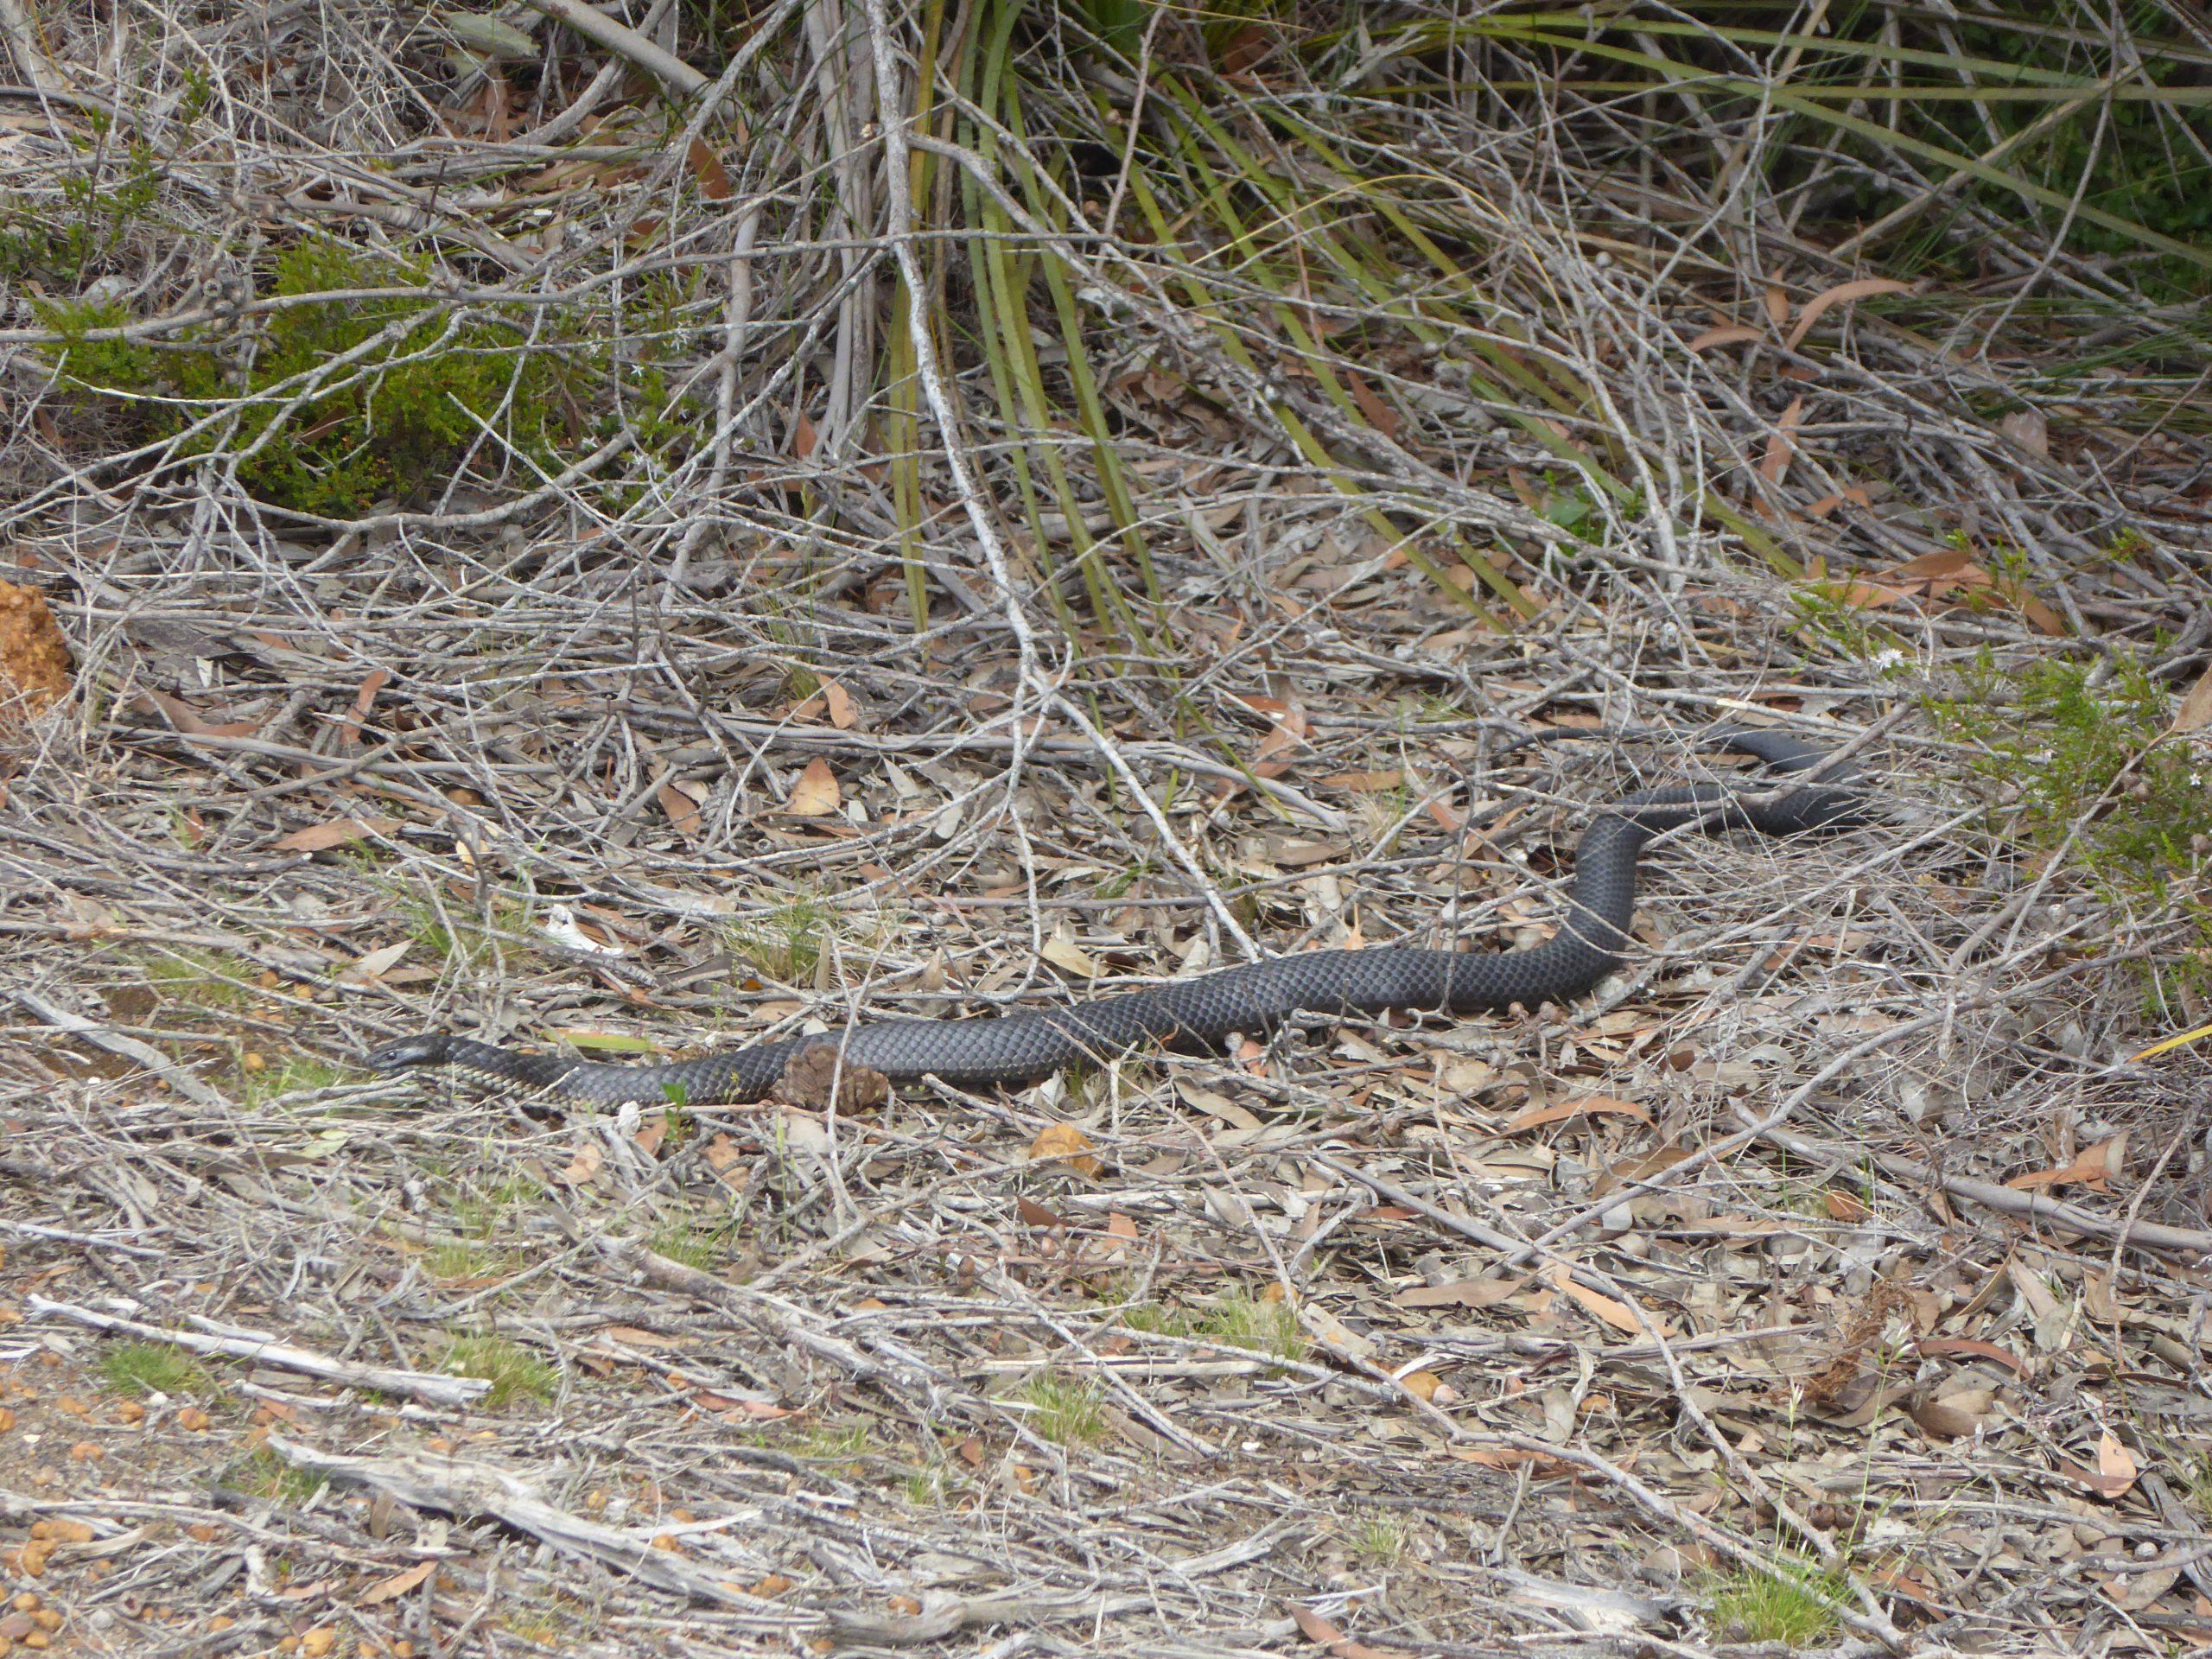 Radreise Australien 2016 - Kangaroo Island - Schwarze Tigerotter (Notechis ater)